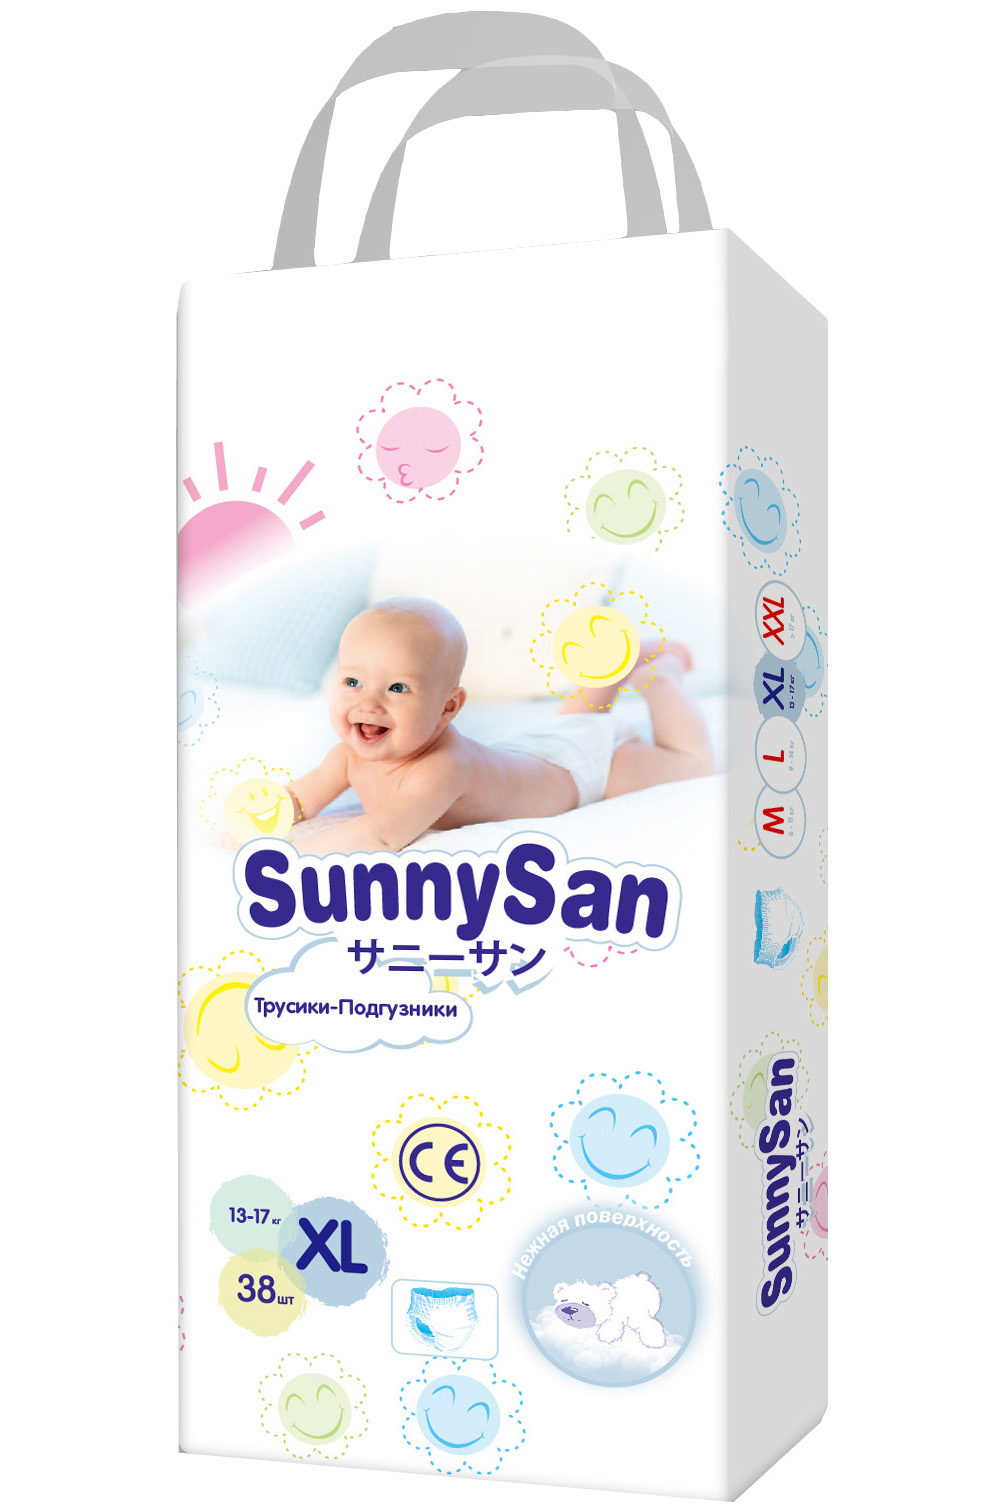 Трусики-подгузники SunnySan XL (13-17 кг) 38 шт.